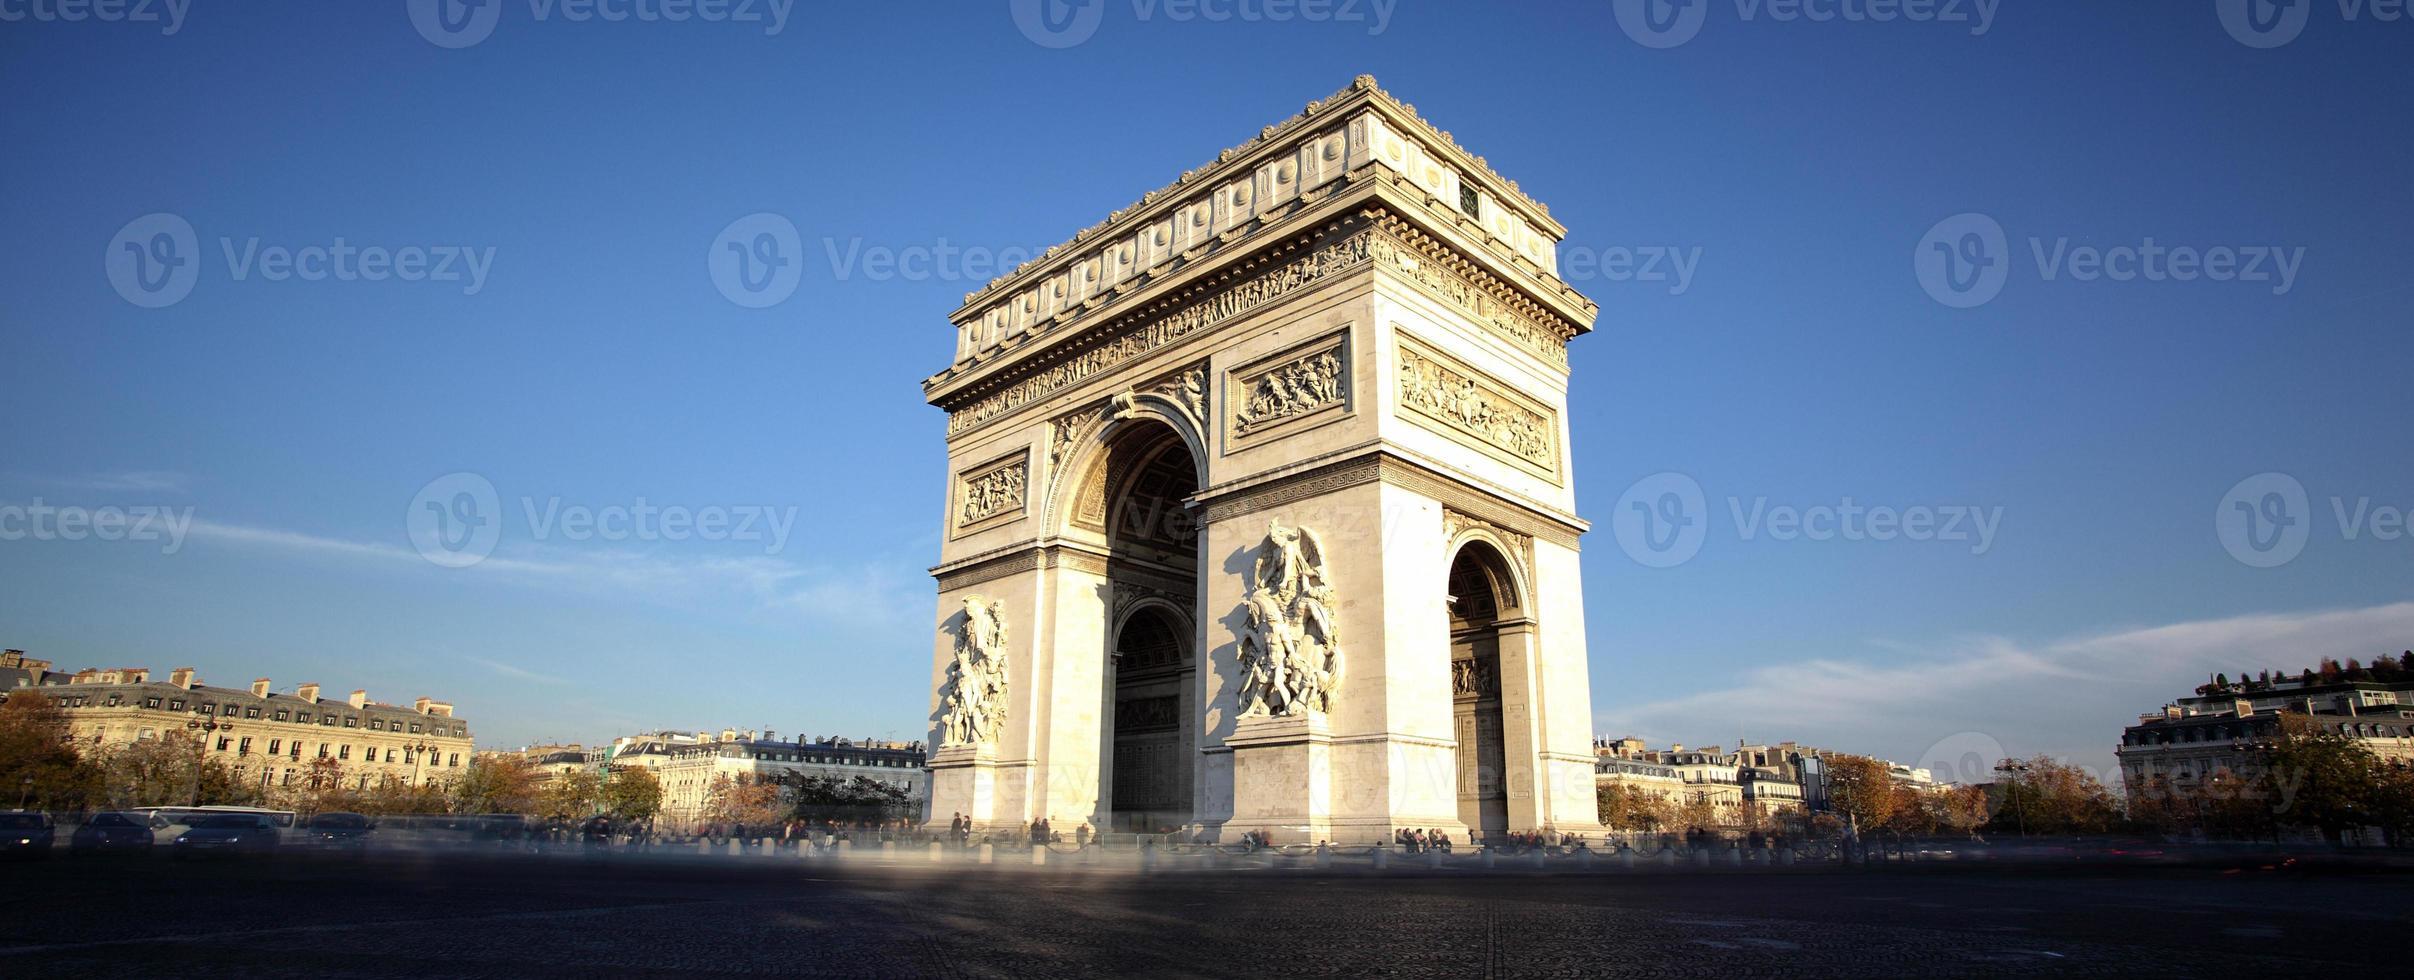 Panoramablick auf den Arc de Triomphe foto